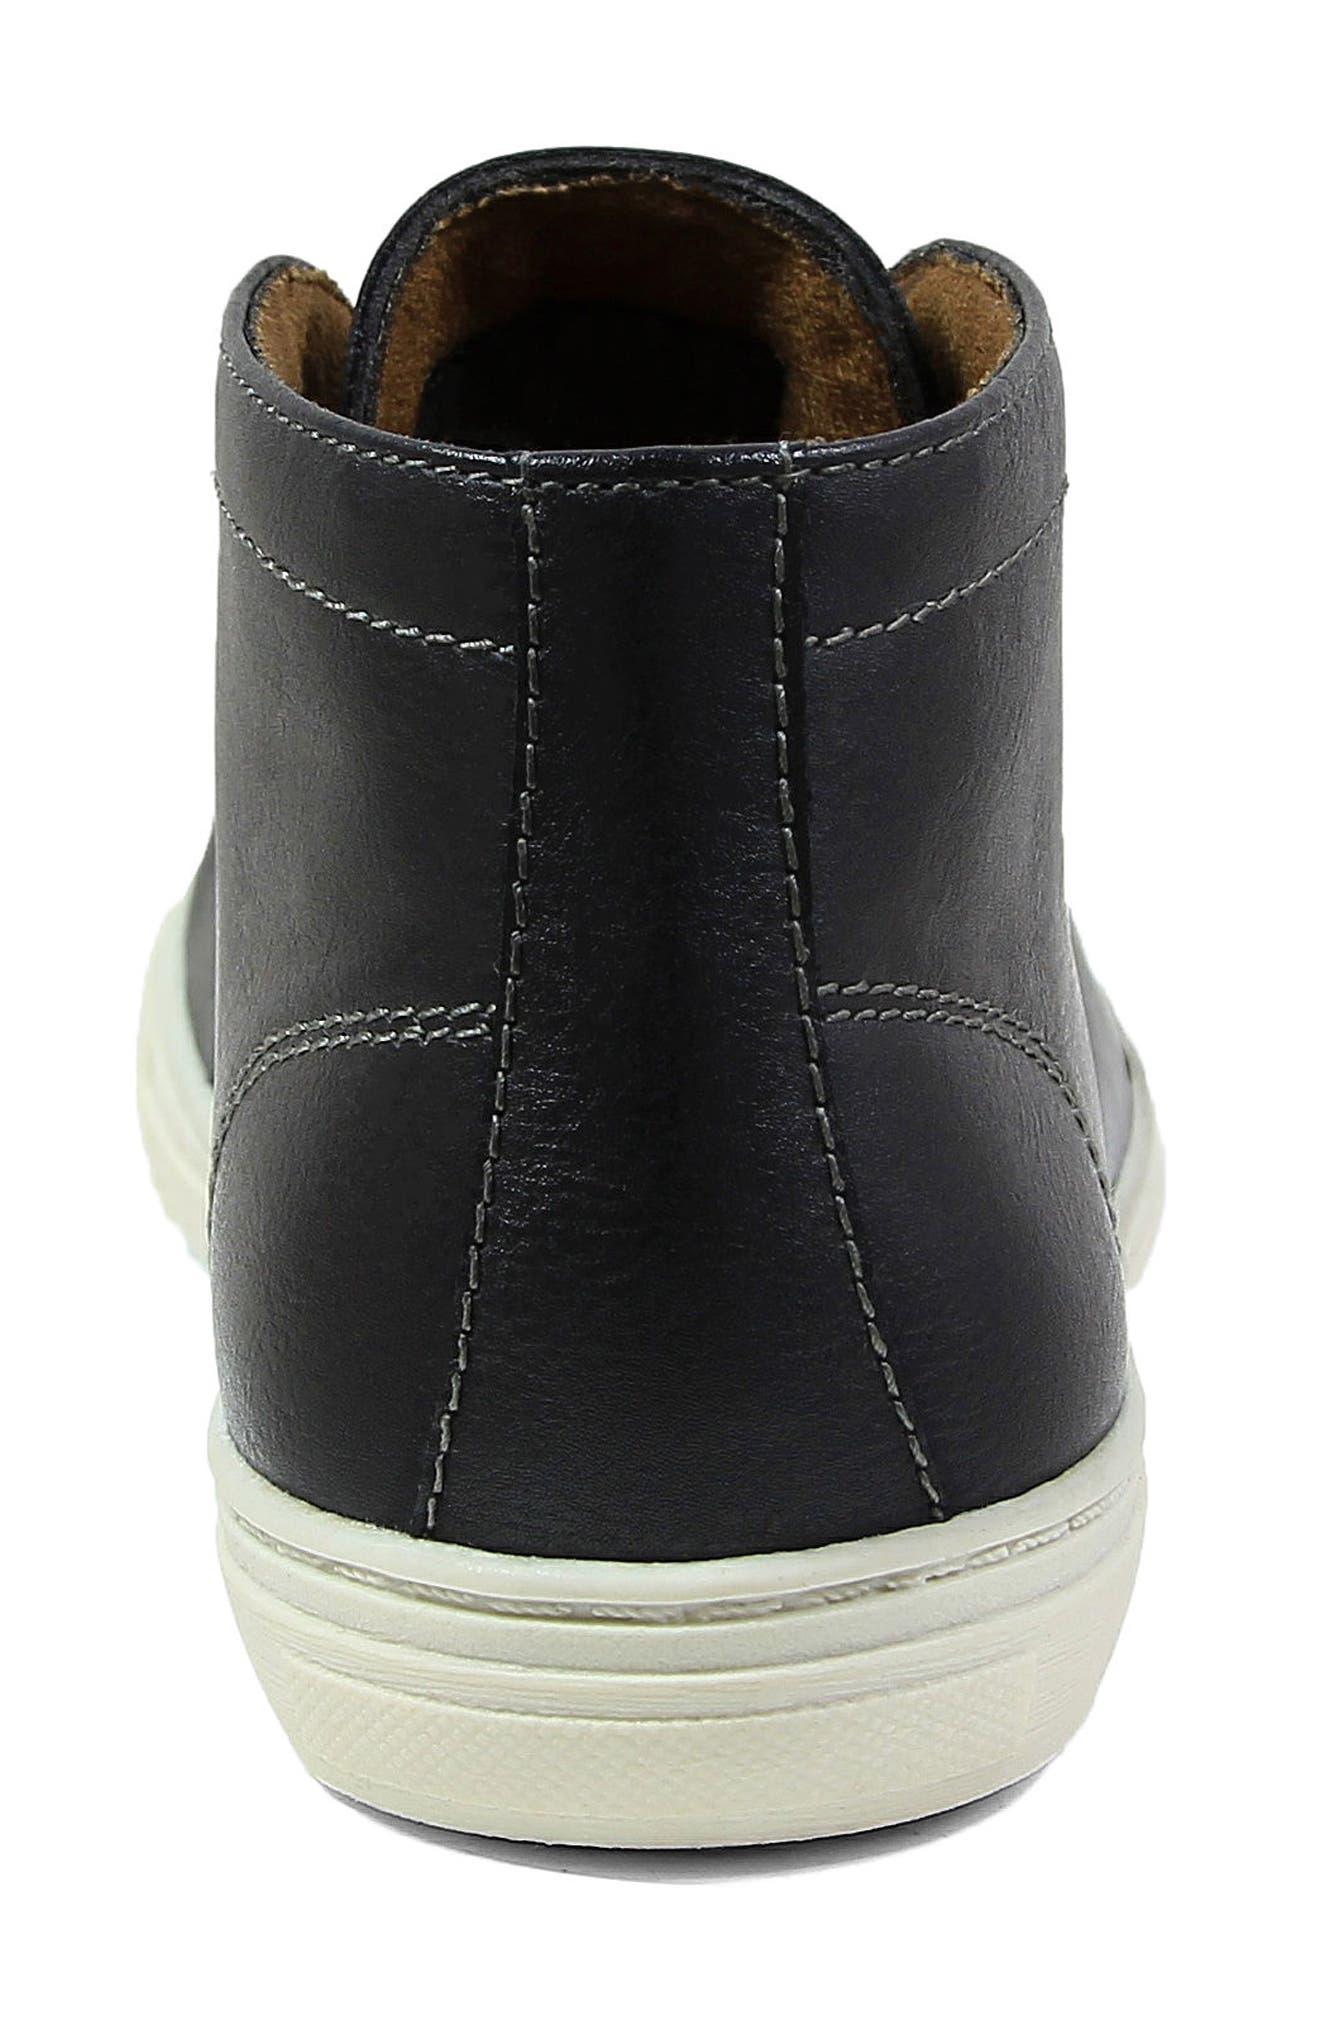 Curb Chukka Sneaker Boot,                             Alternate thumbnail 7, color,                             Black